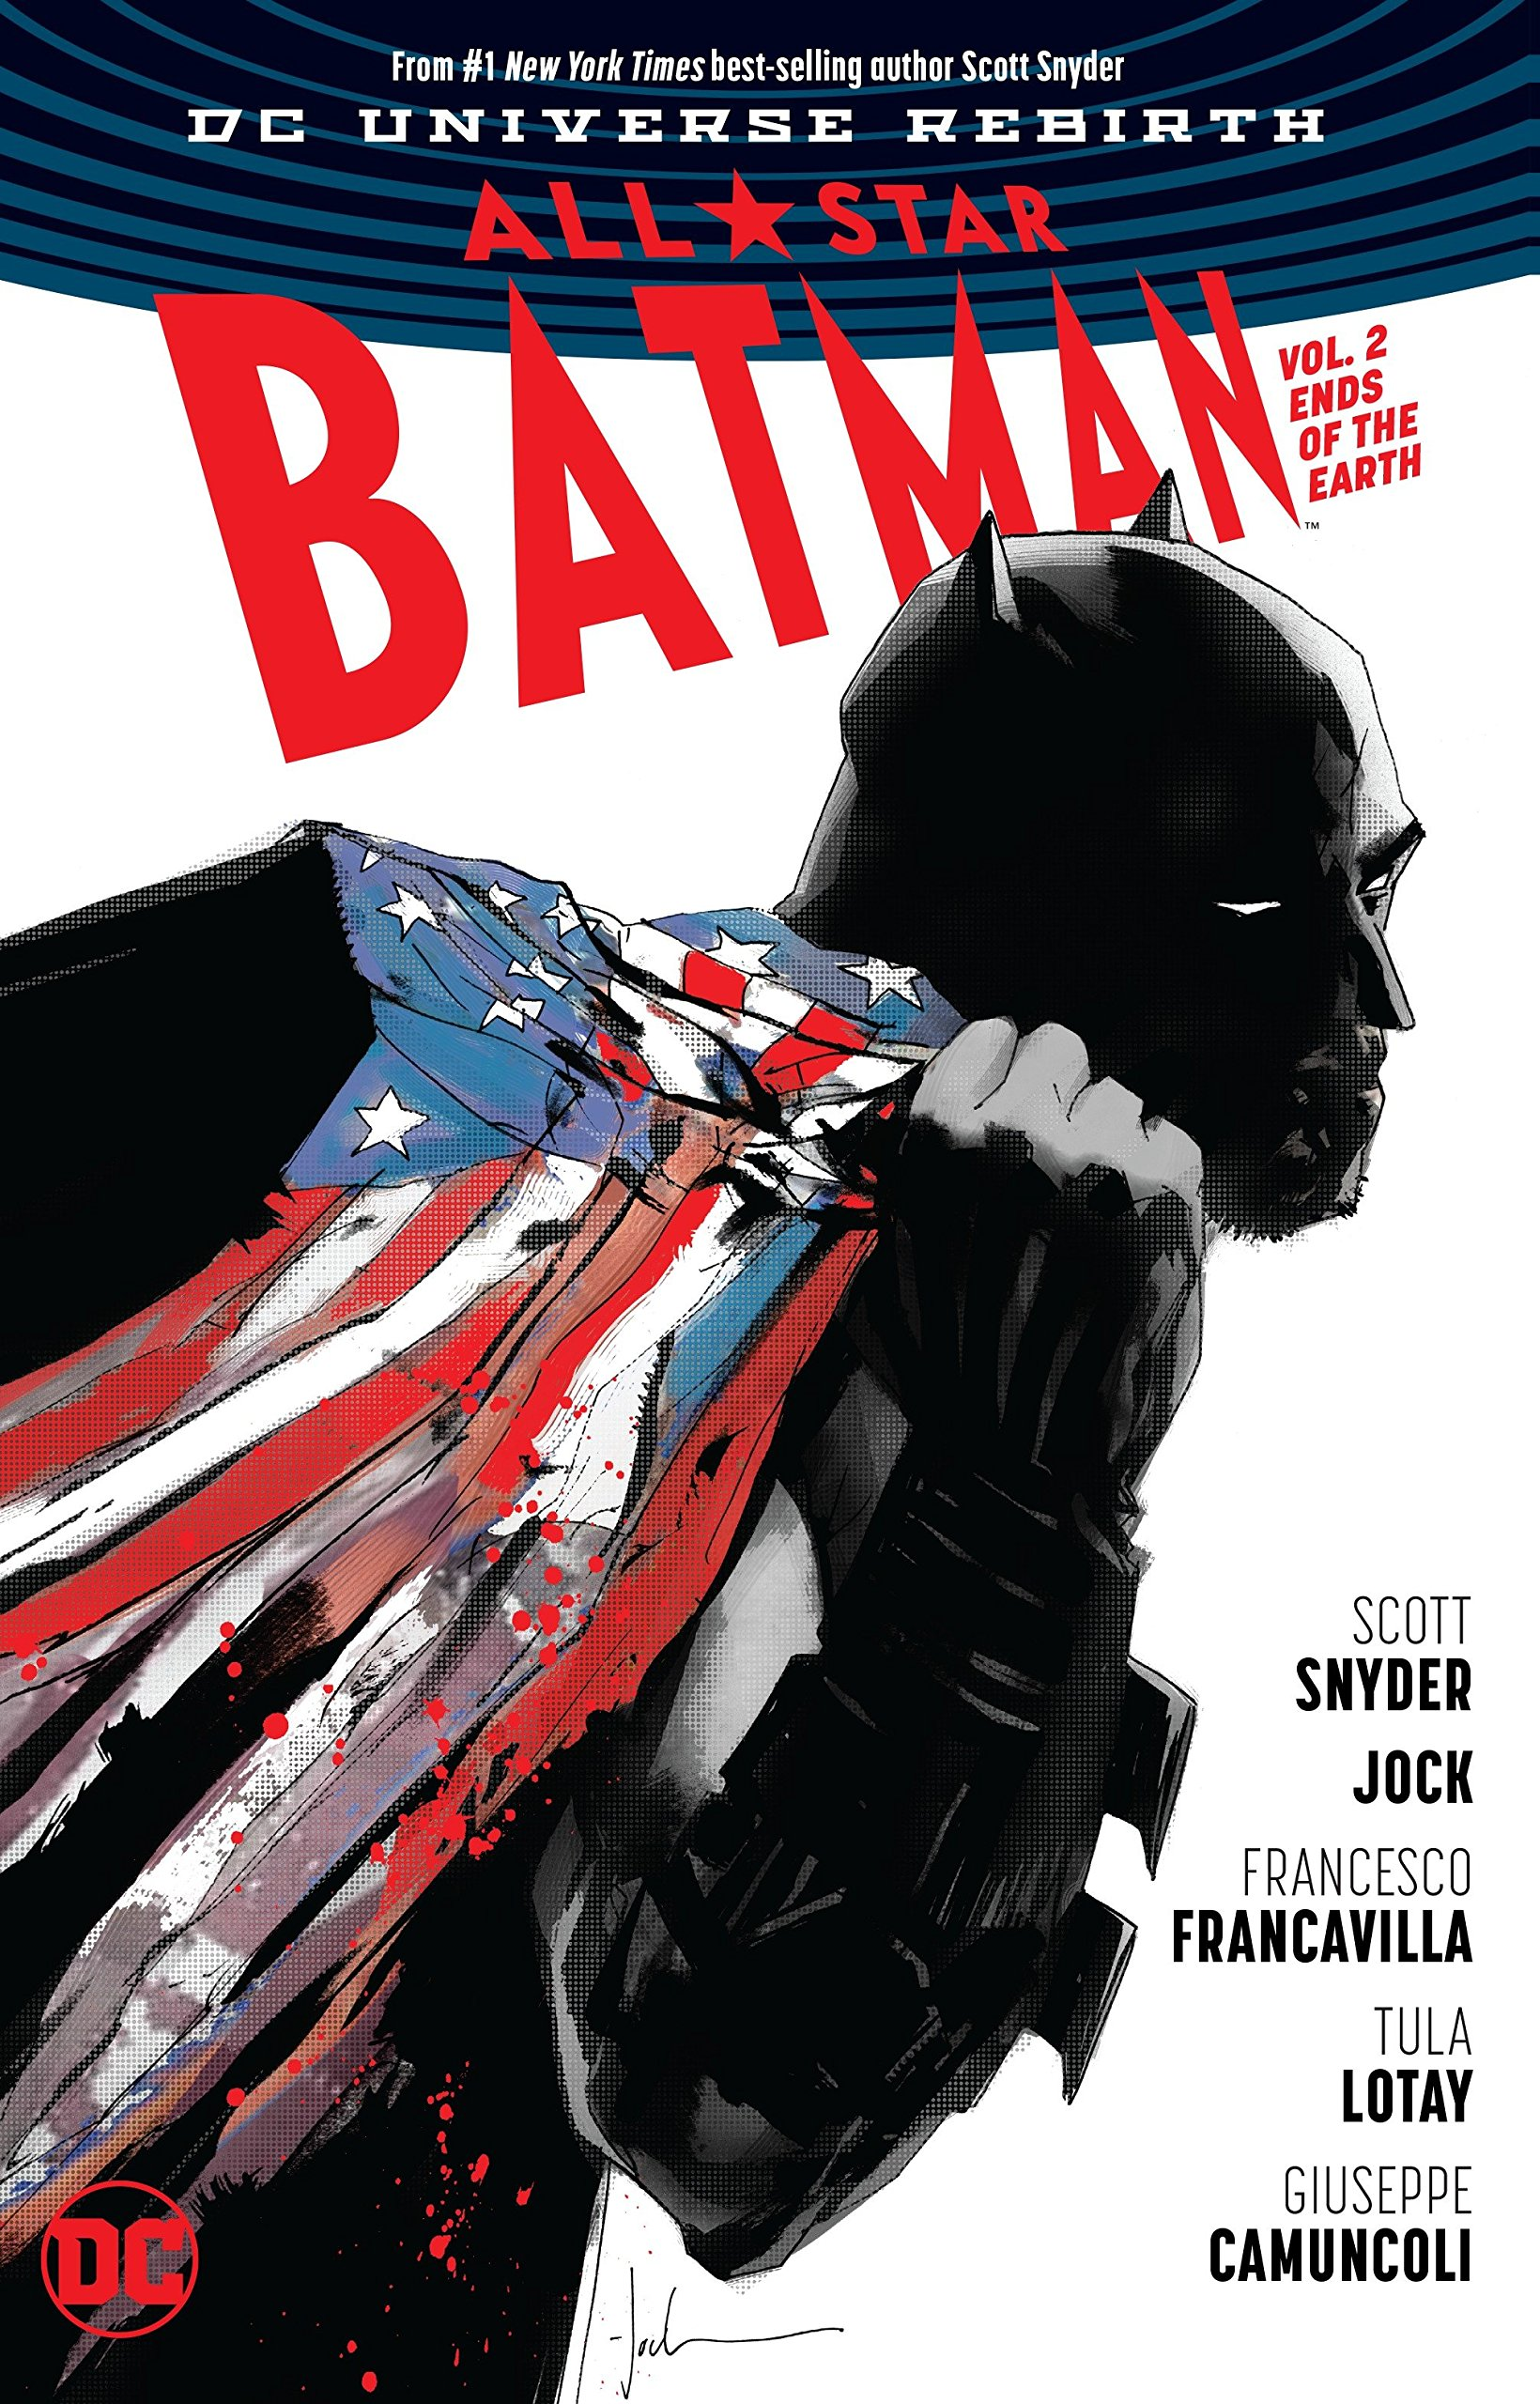 All Star Batman Vol. 2: Ends of the Earth (All-Star Batman: DC Universe Rebirth)